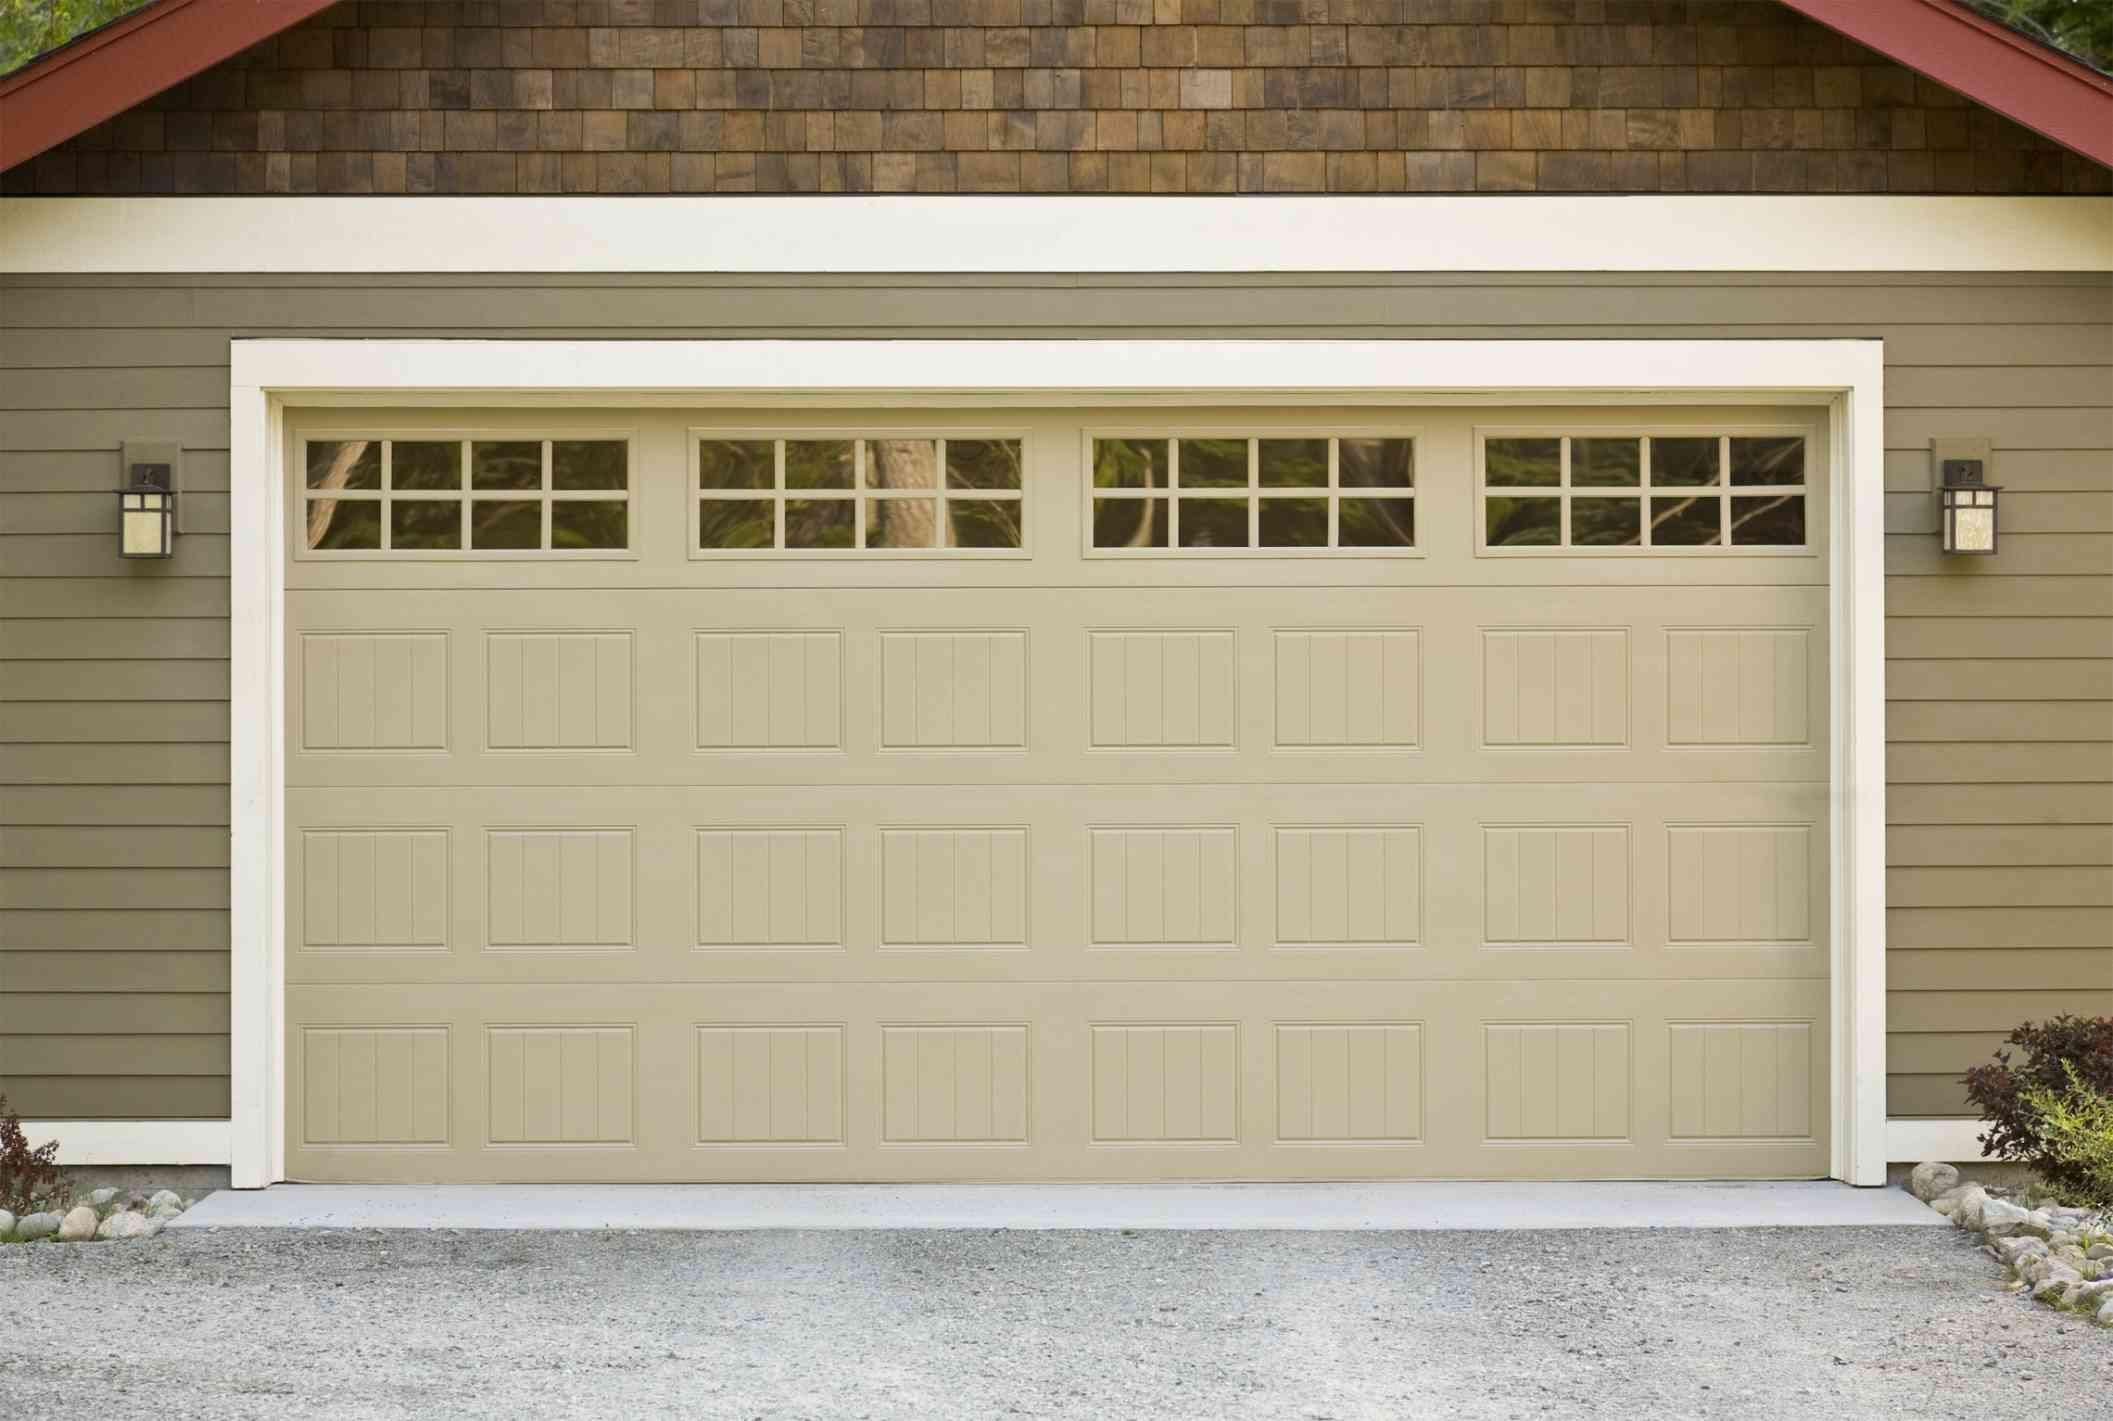 Garage Burglar Proofing Tips To Protect Your Garage From Break